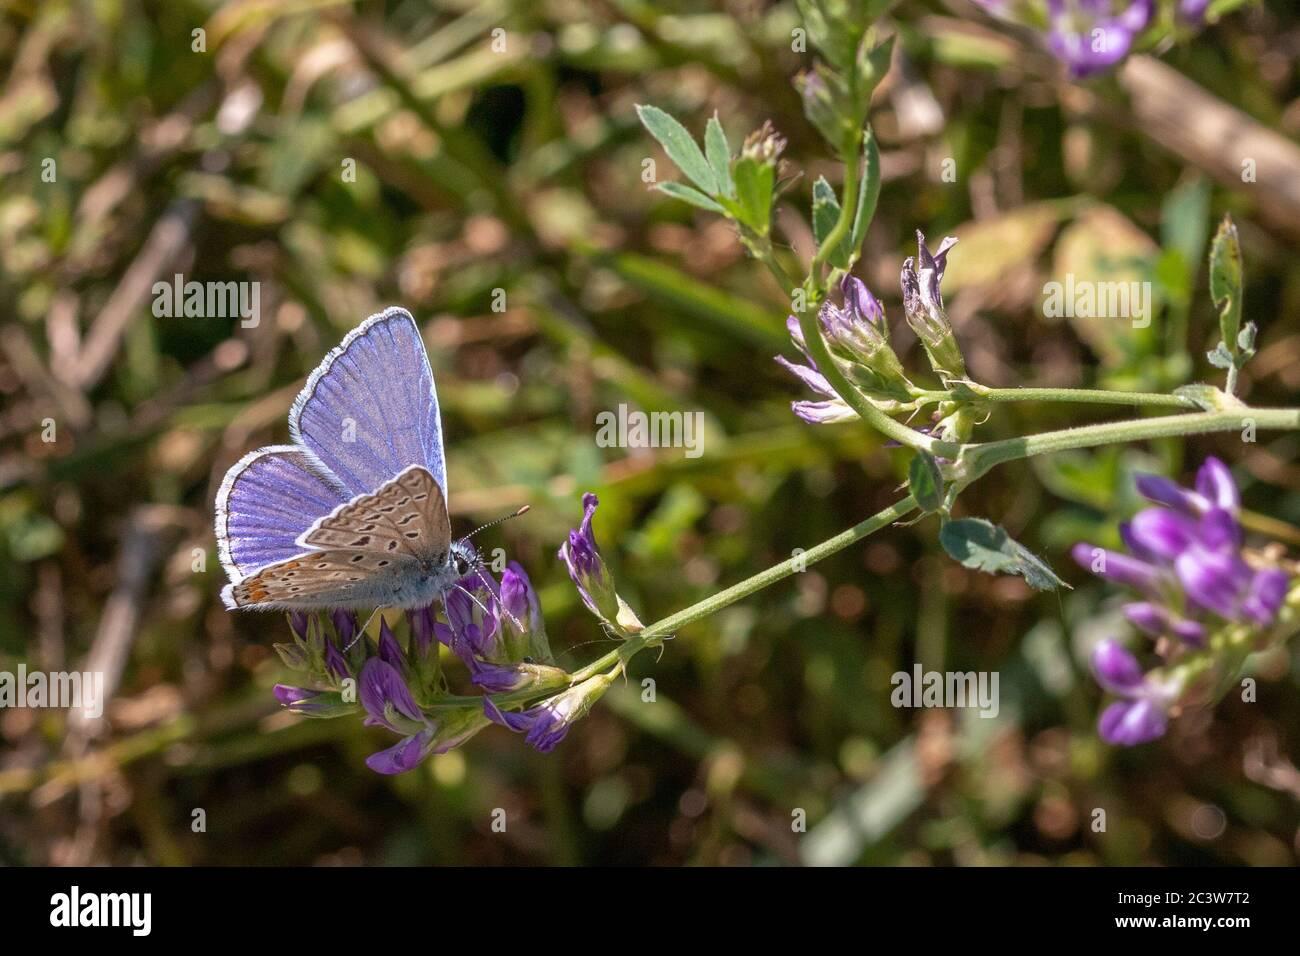 Polyommatus celina, Mariposa Azul del Sur Foto de stock